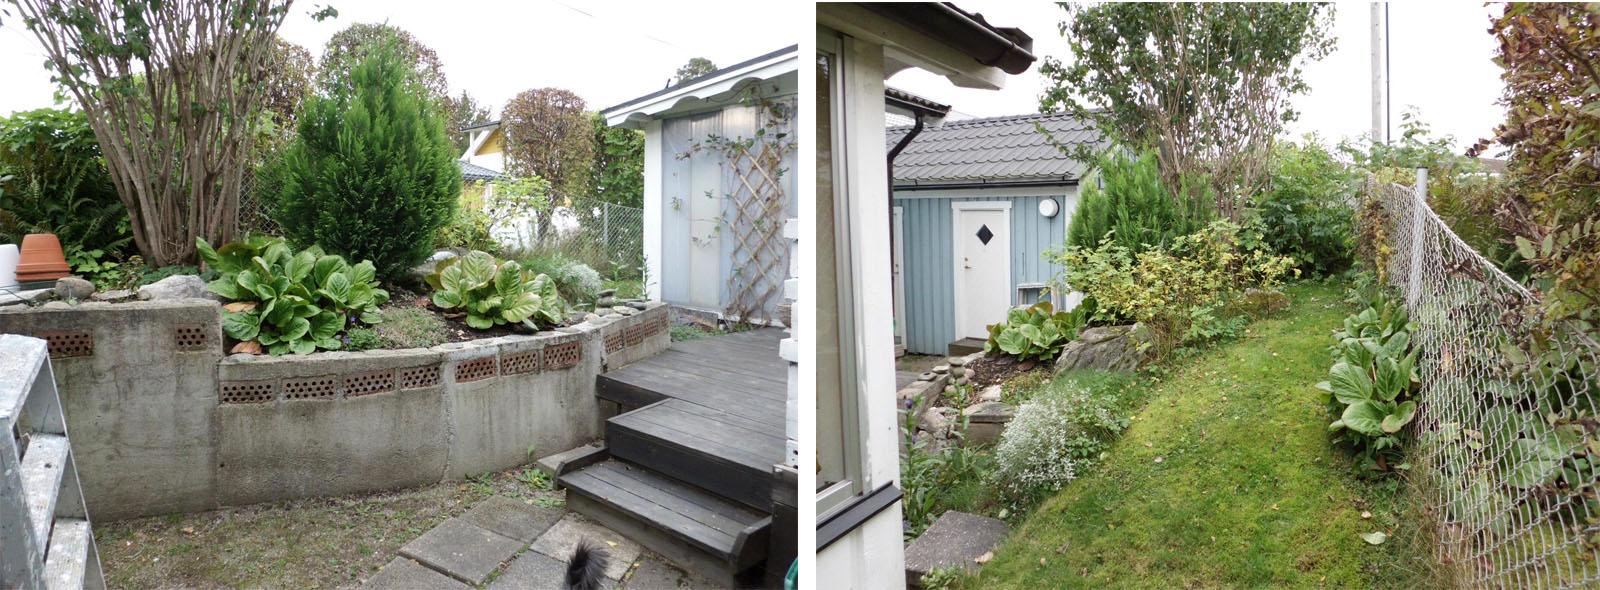 Trädgårdsidé, Västerås